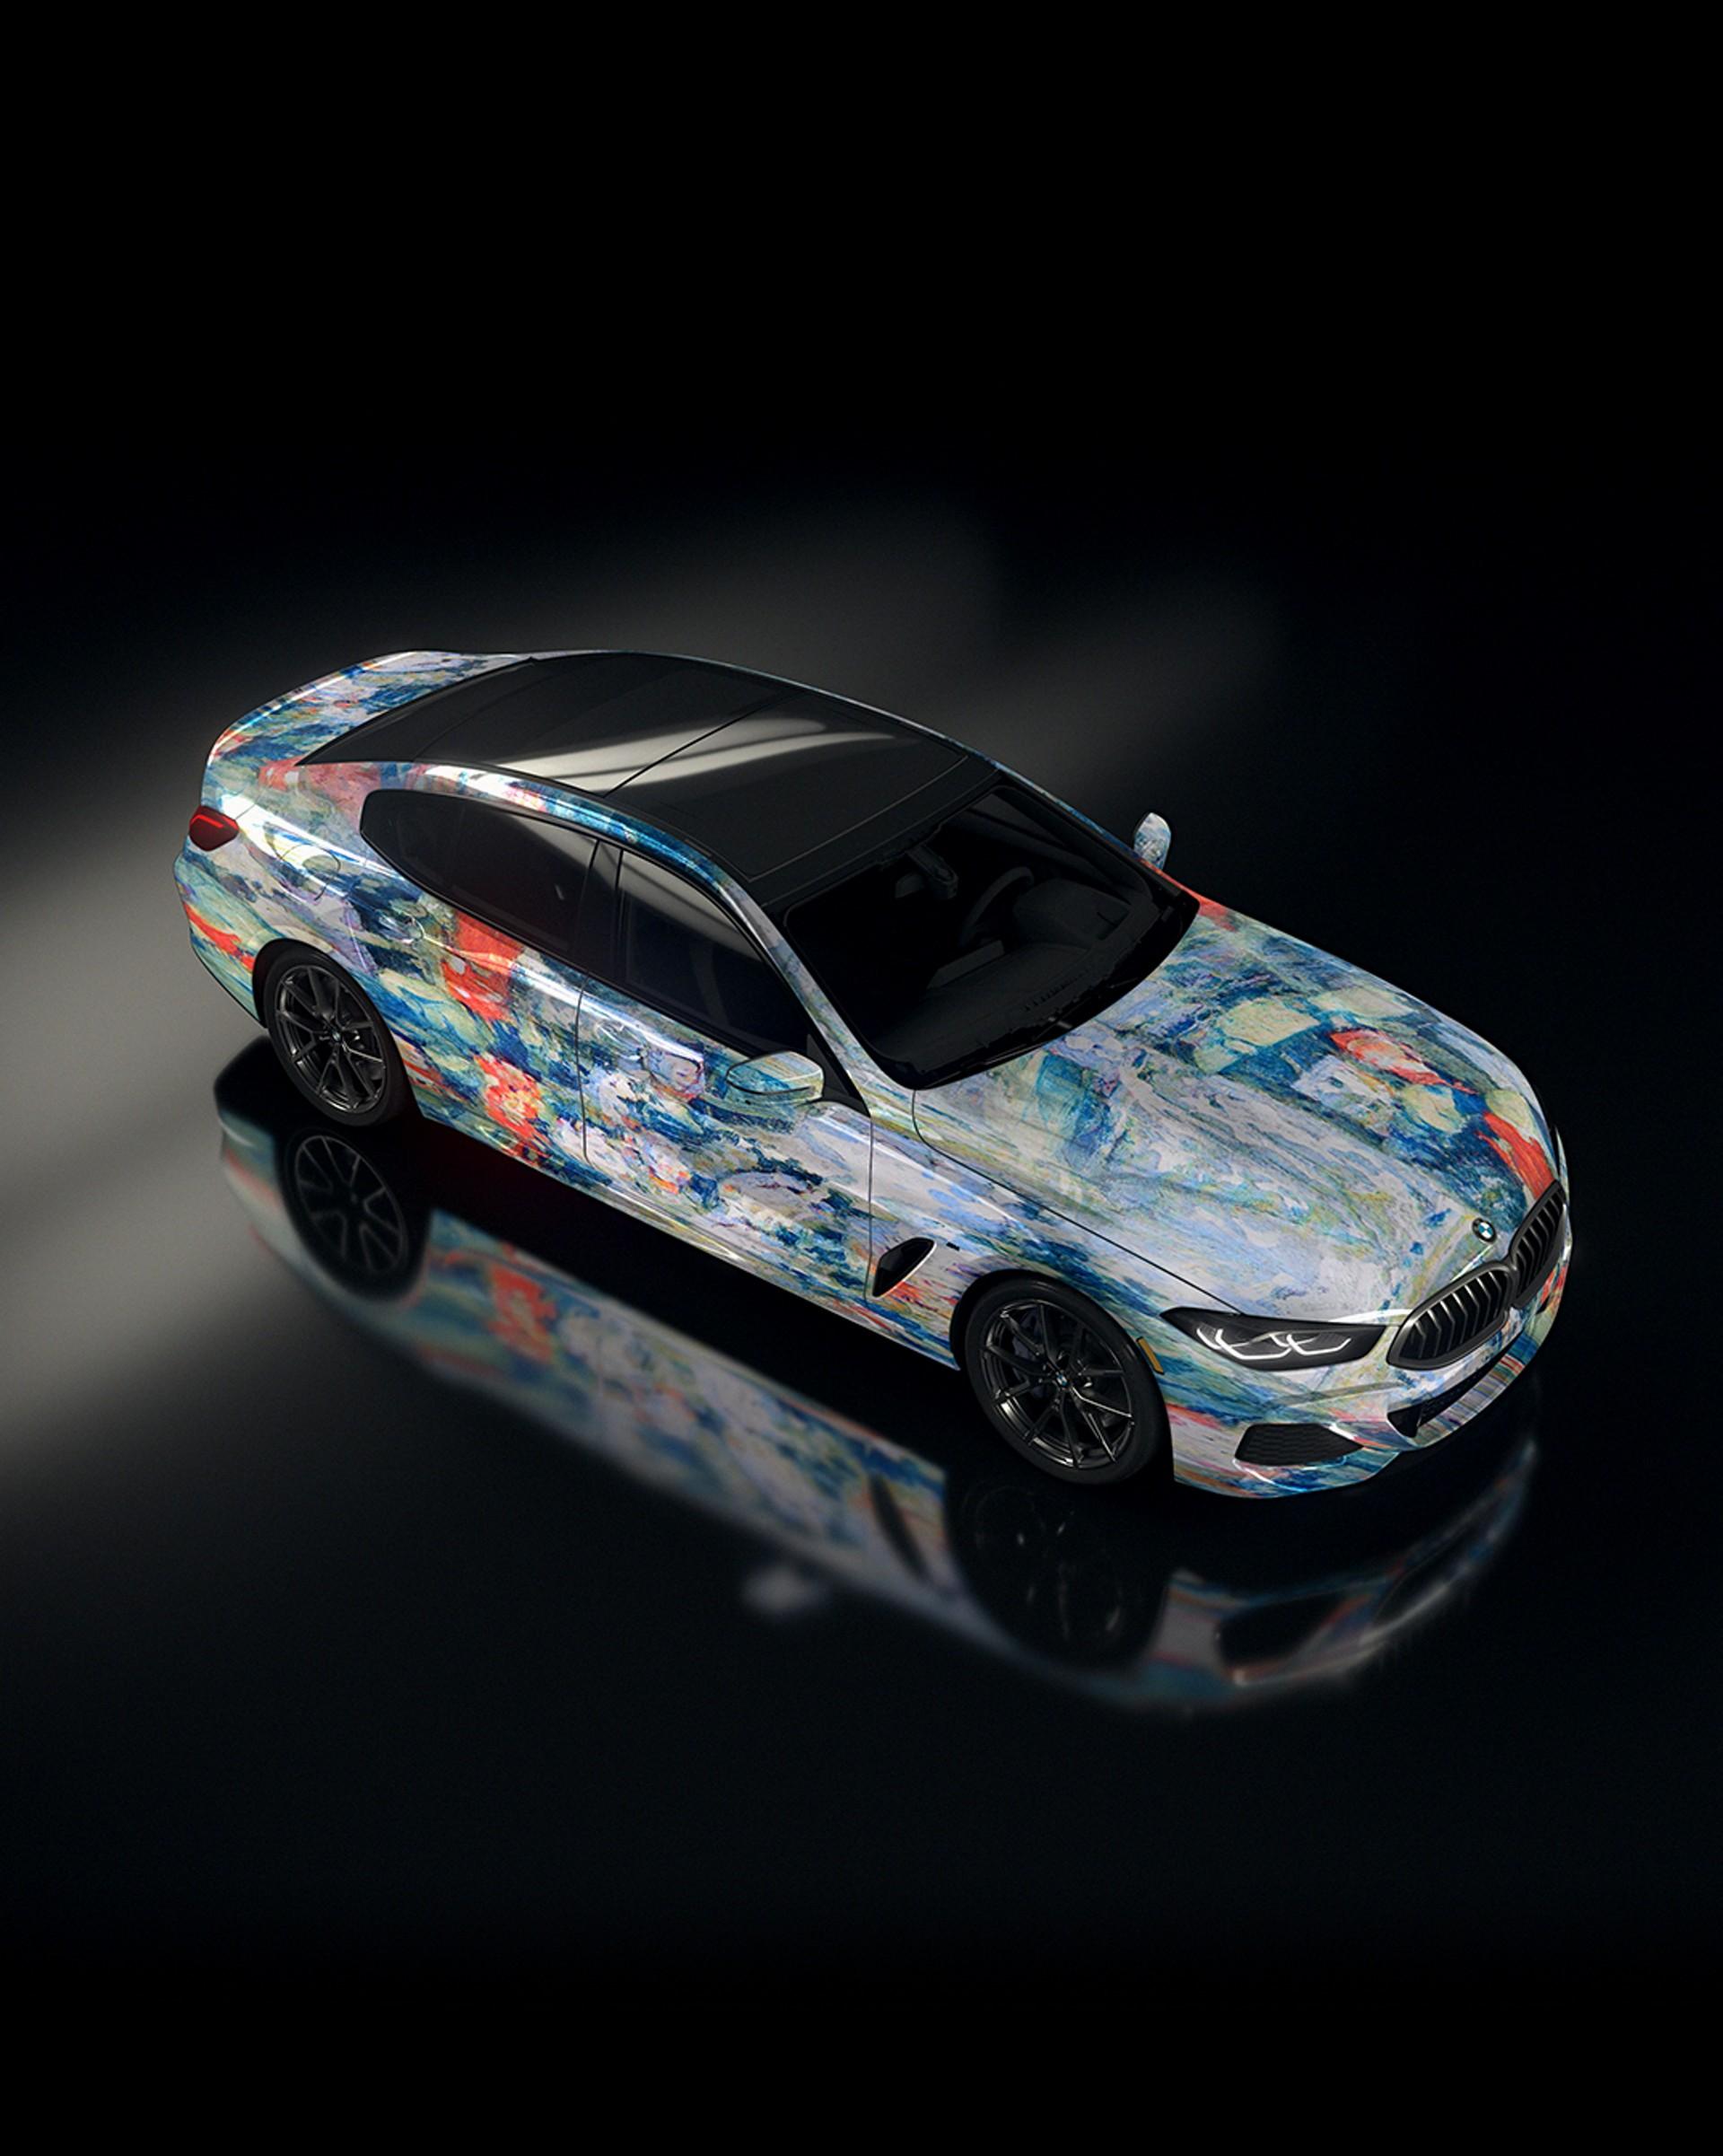 BMW-8-Series-Gran-Coupe-art-car-28